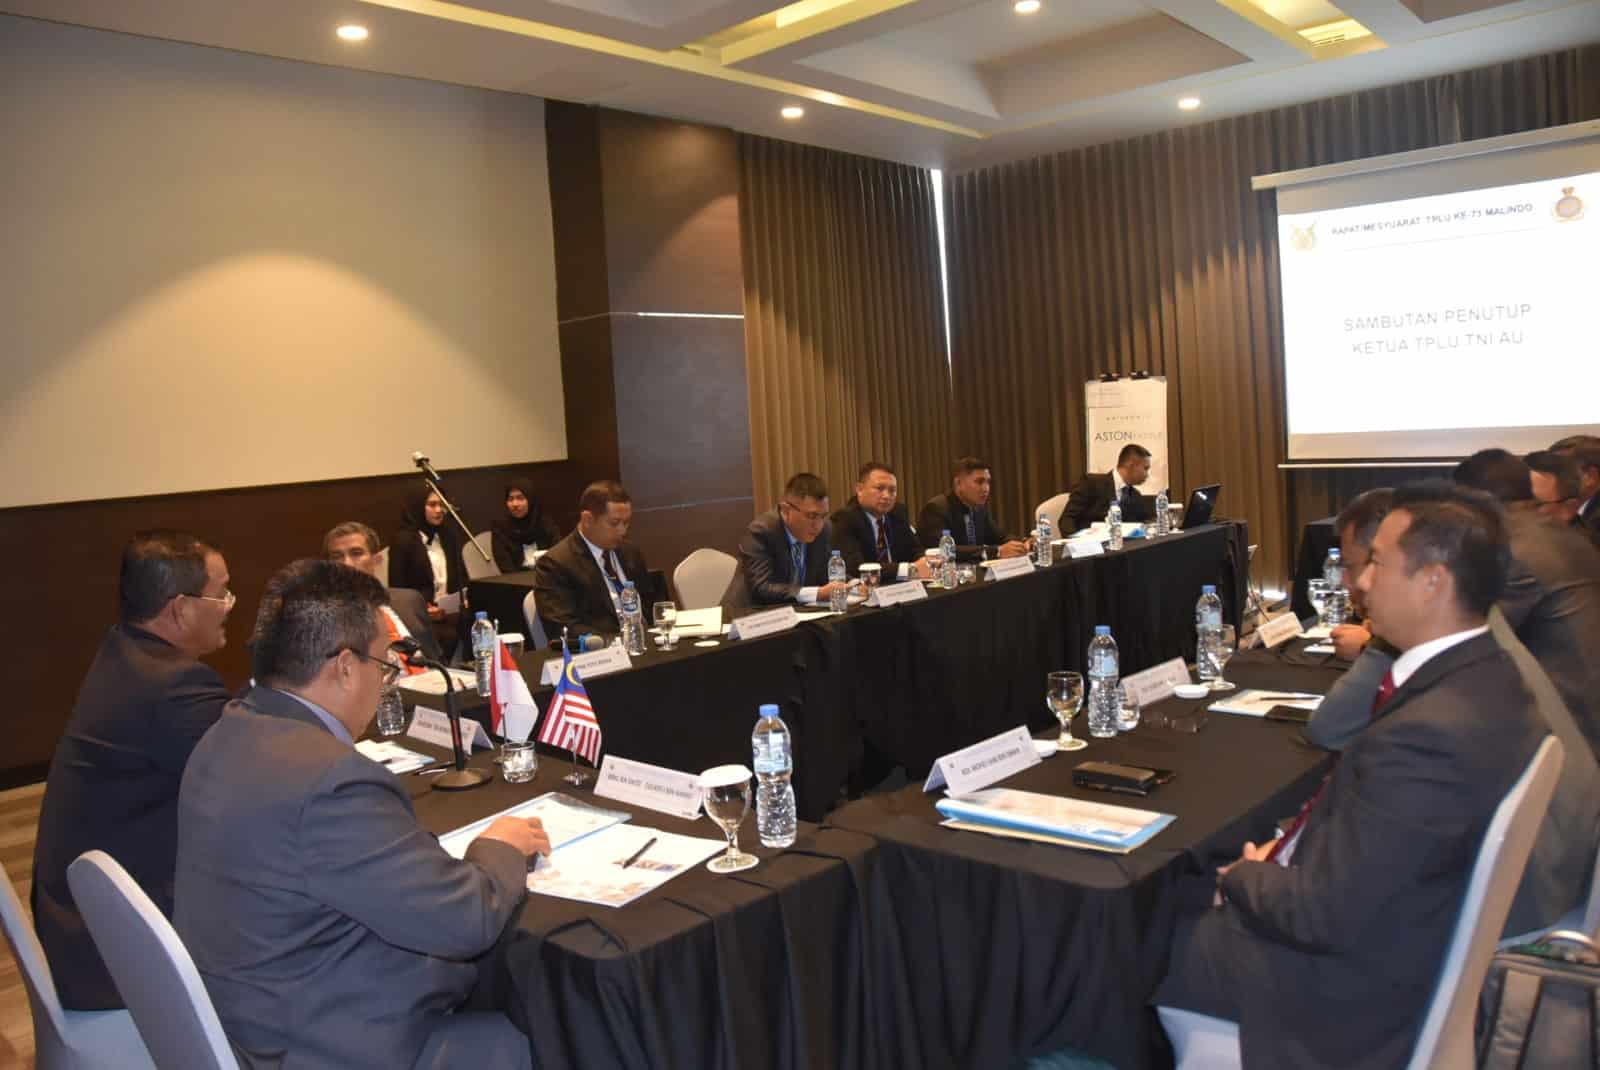 TPLU TNI-AU & TUDM Kembali Jalin Latihan Bersama